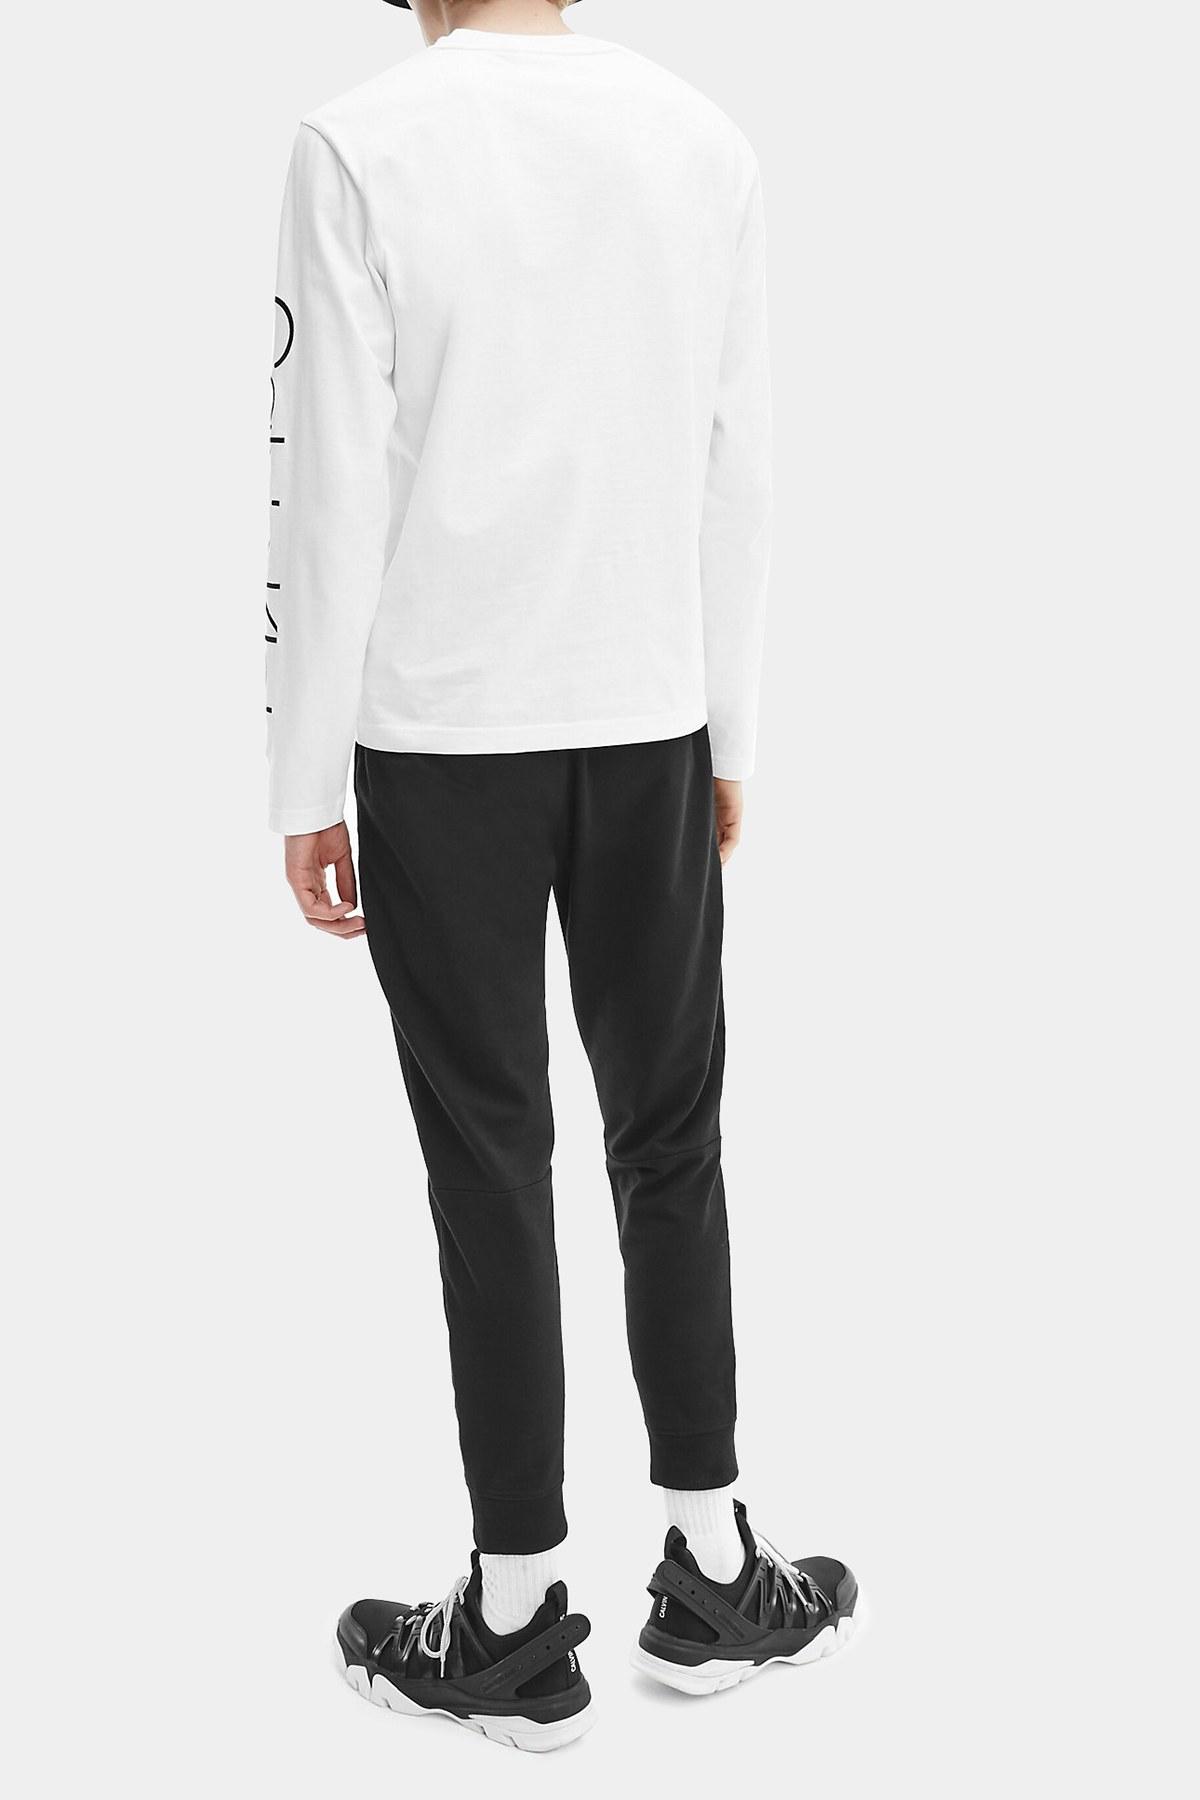 Calvin Klein Erkek T Shirt K10K107156 YAF BEYAZ